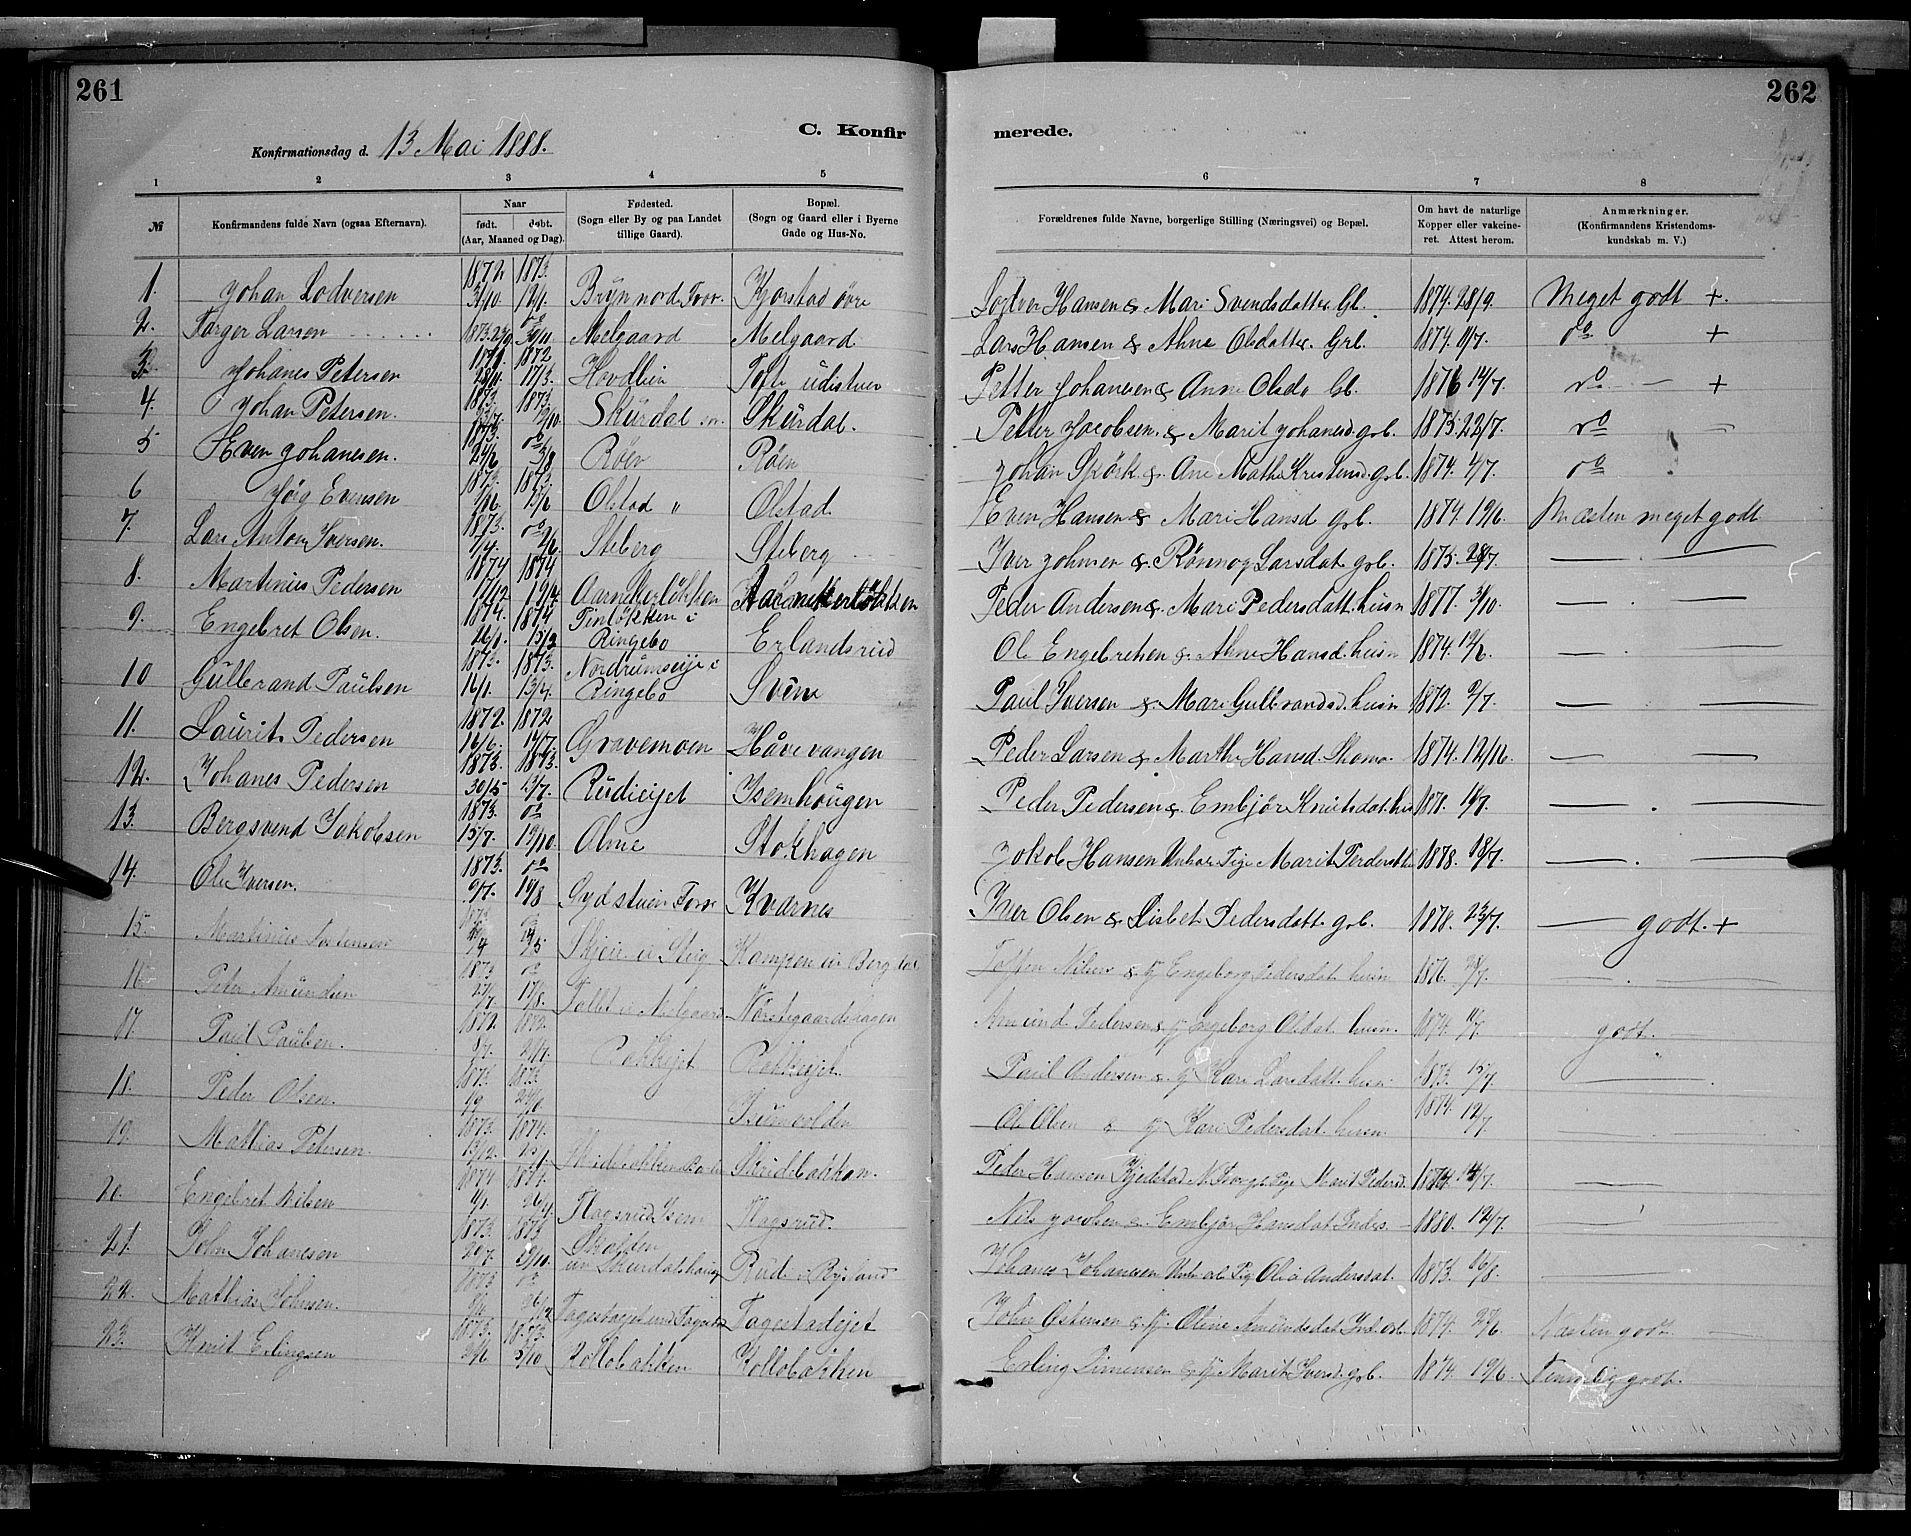 SAH, Sør-Fron prestekontor, H/Ha/Hab/L0003: Klokkerbok nr. 3, 1884-1896, s. 261-262